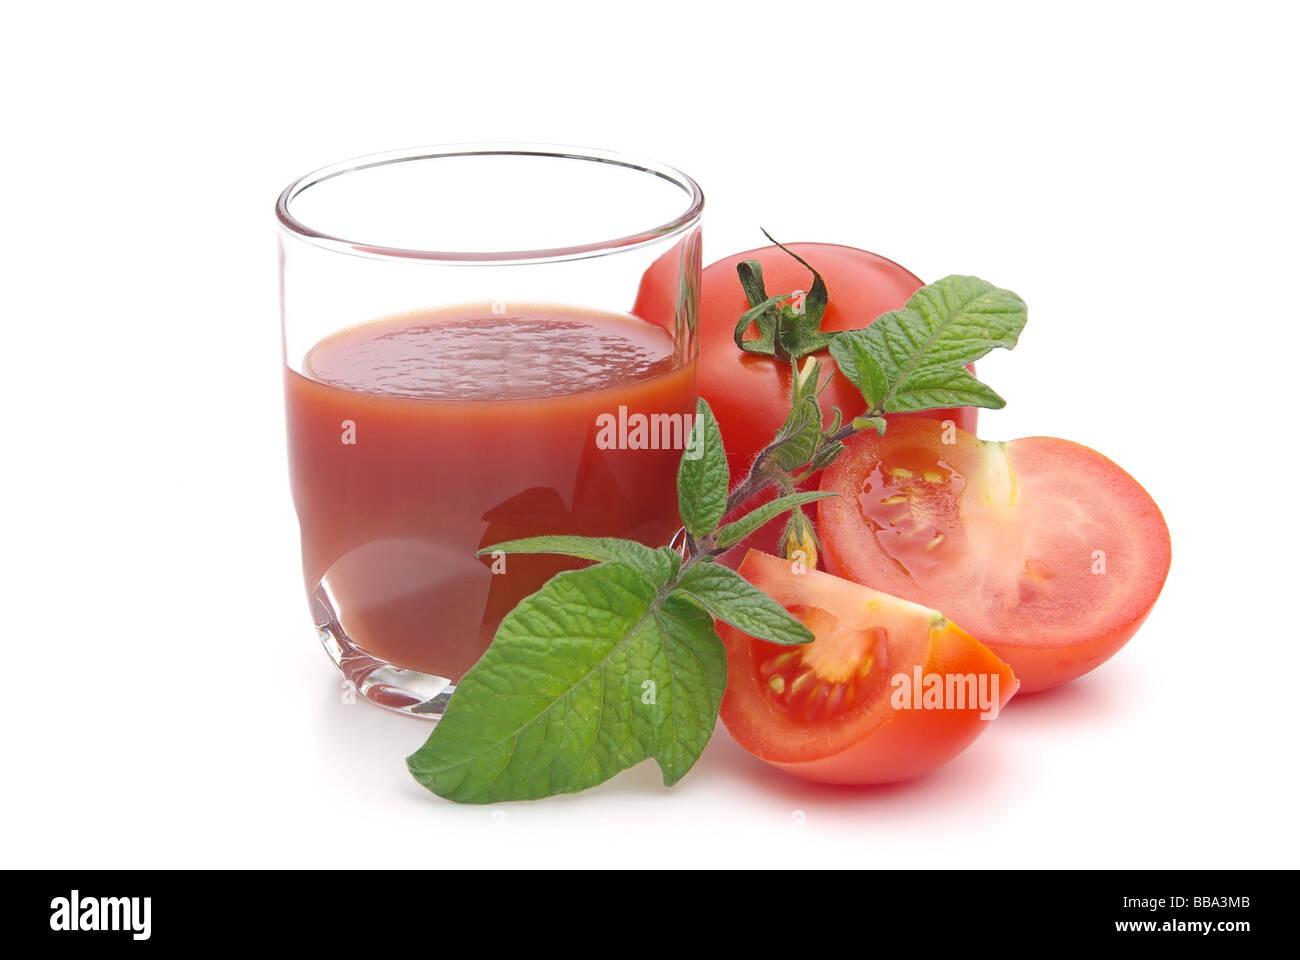 Tomatensaft tomato juice 03 - Stock Image